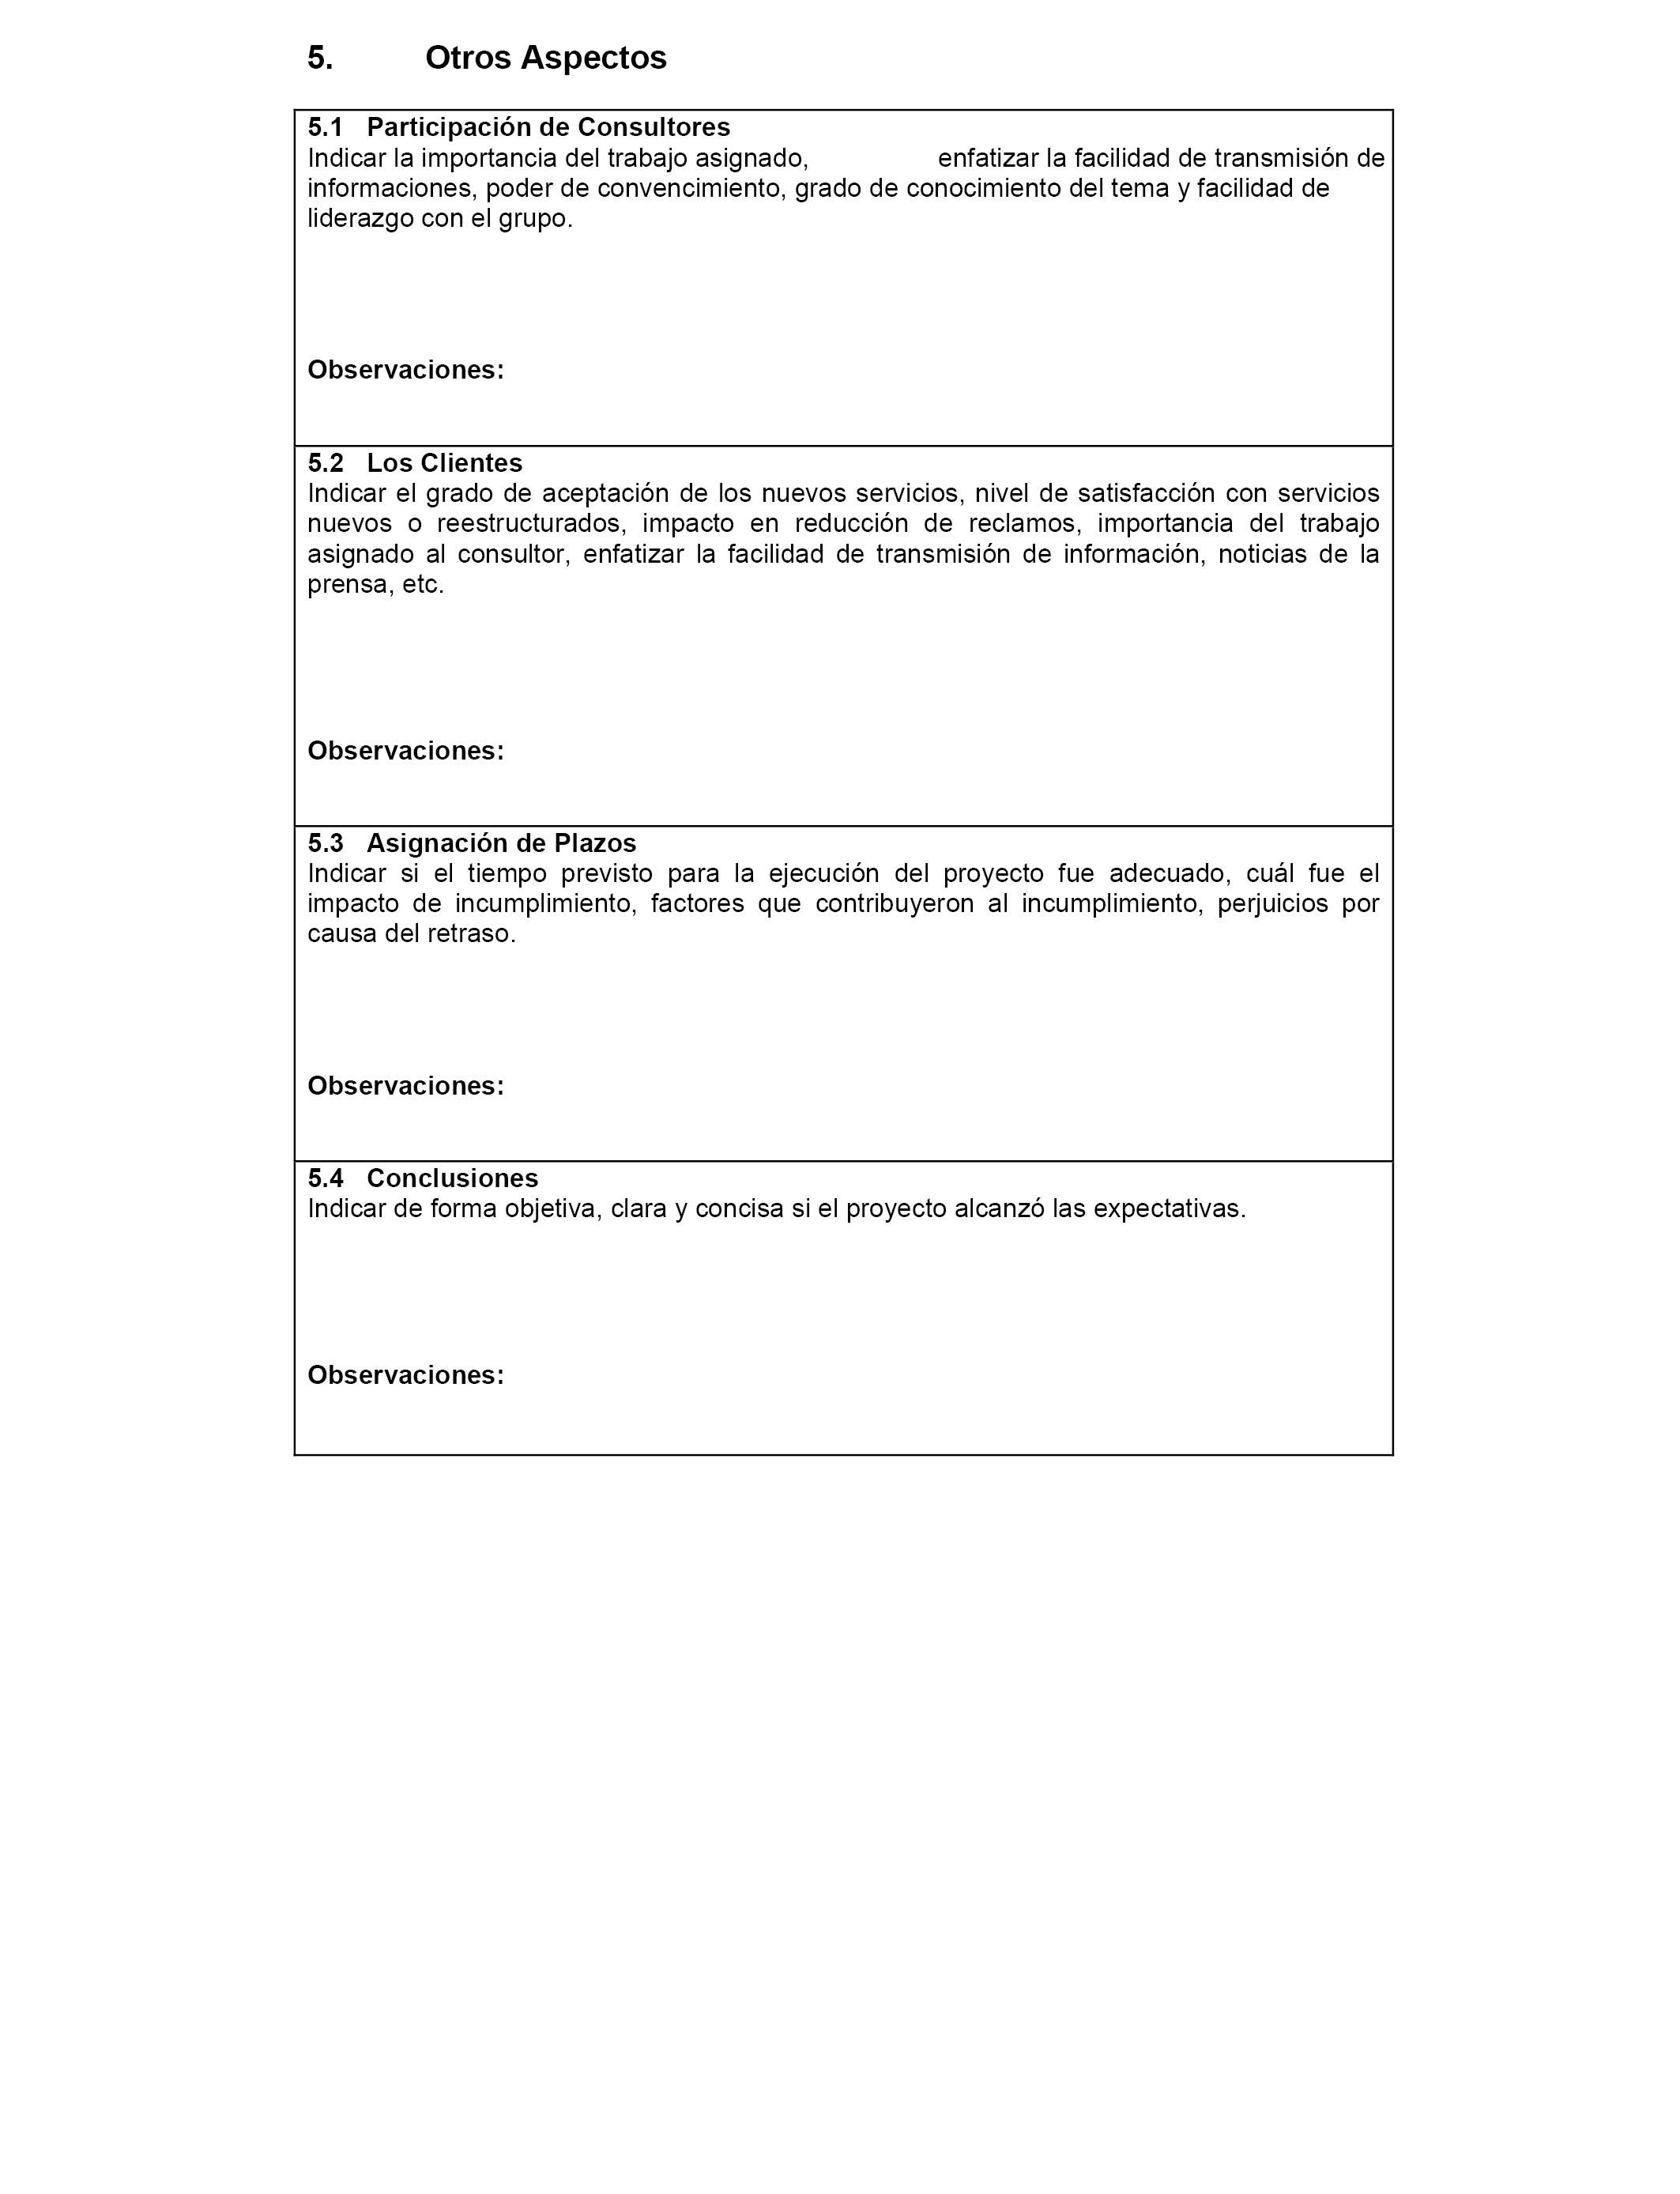 BOE.es - Documento BOE-A-2018-3076